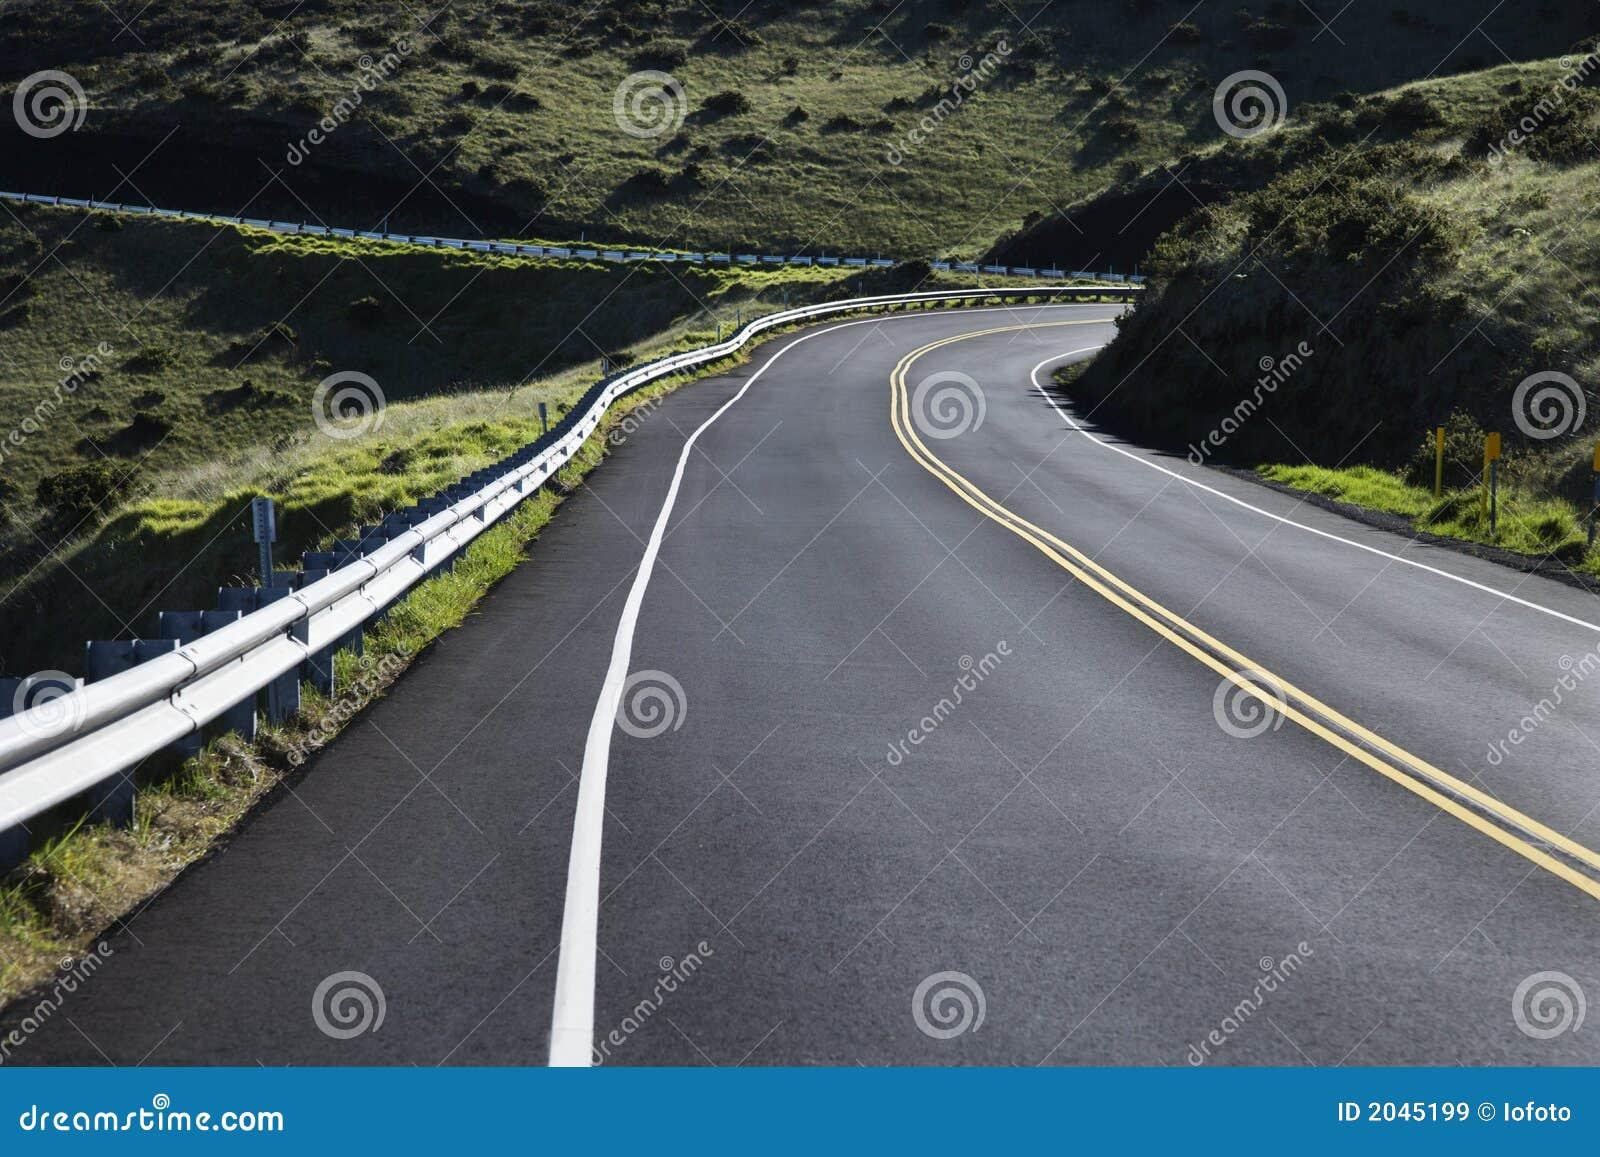 Haleakala park road